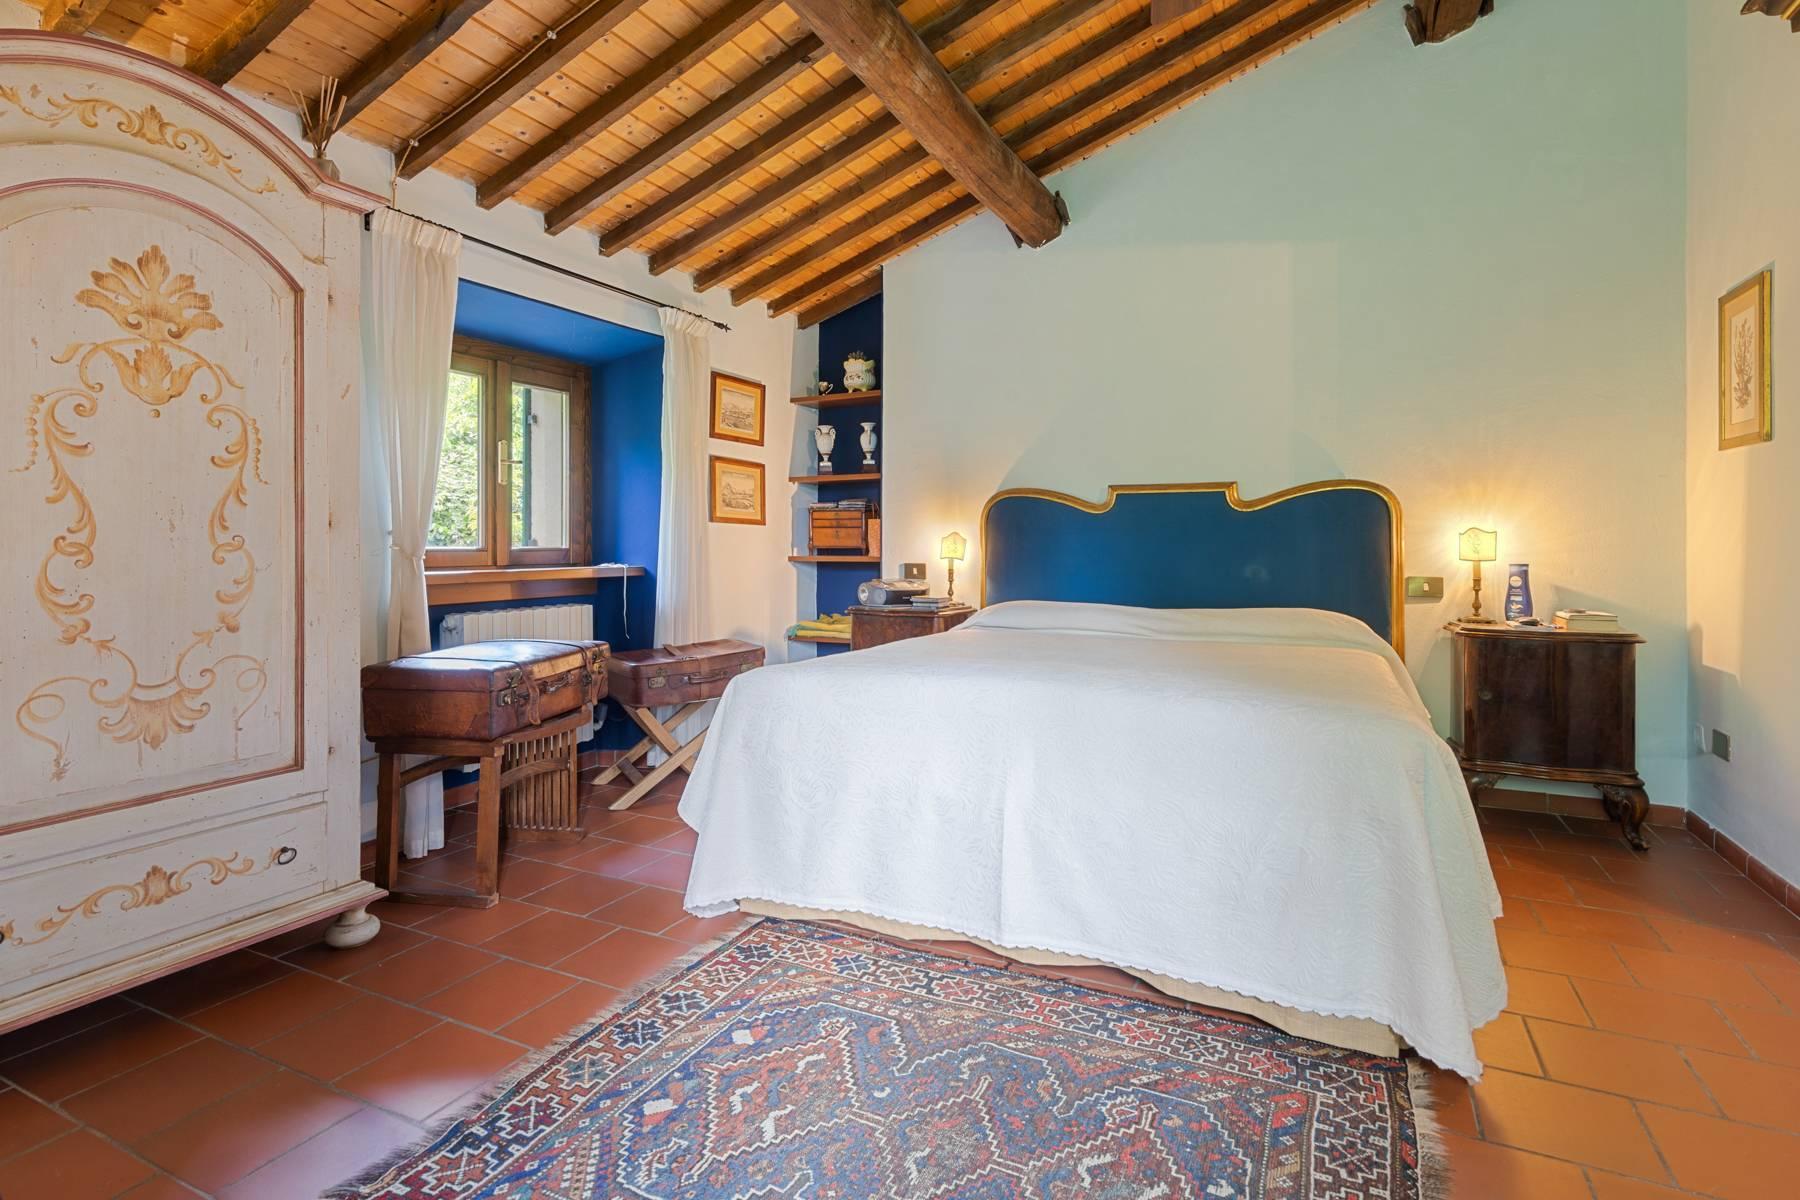 Affascinante villa Veneta a pochi minuti da Verona - 28